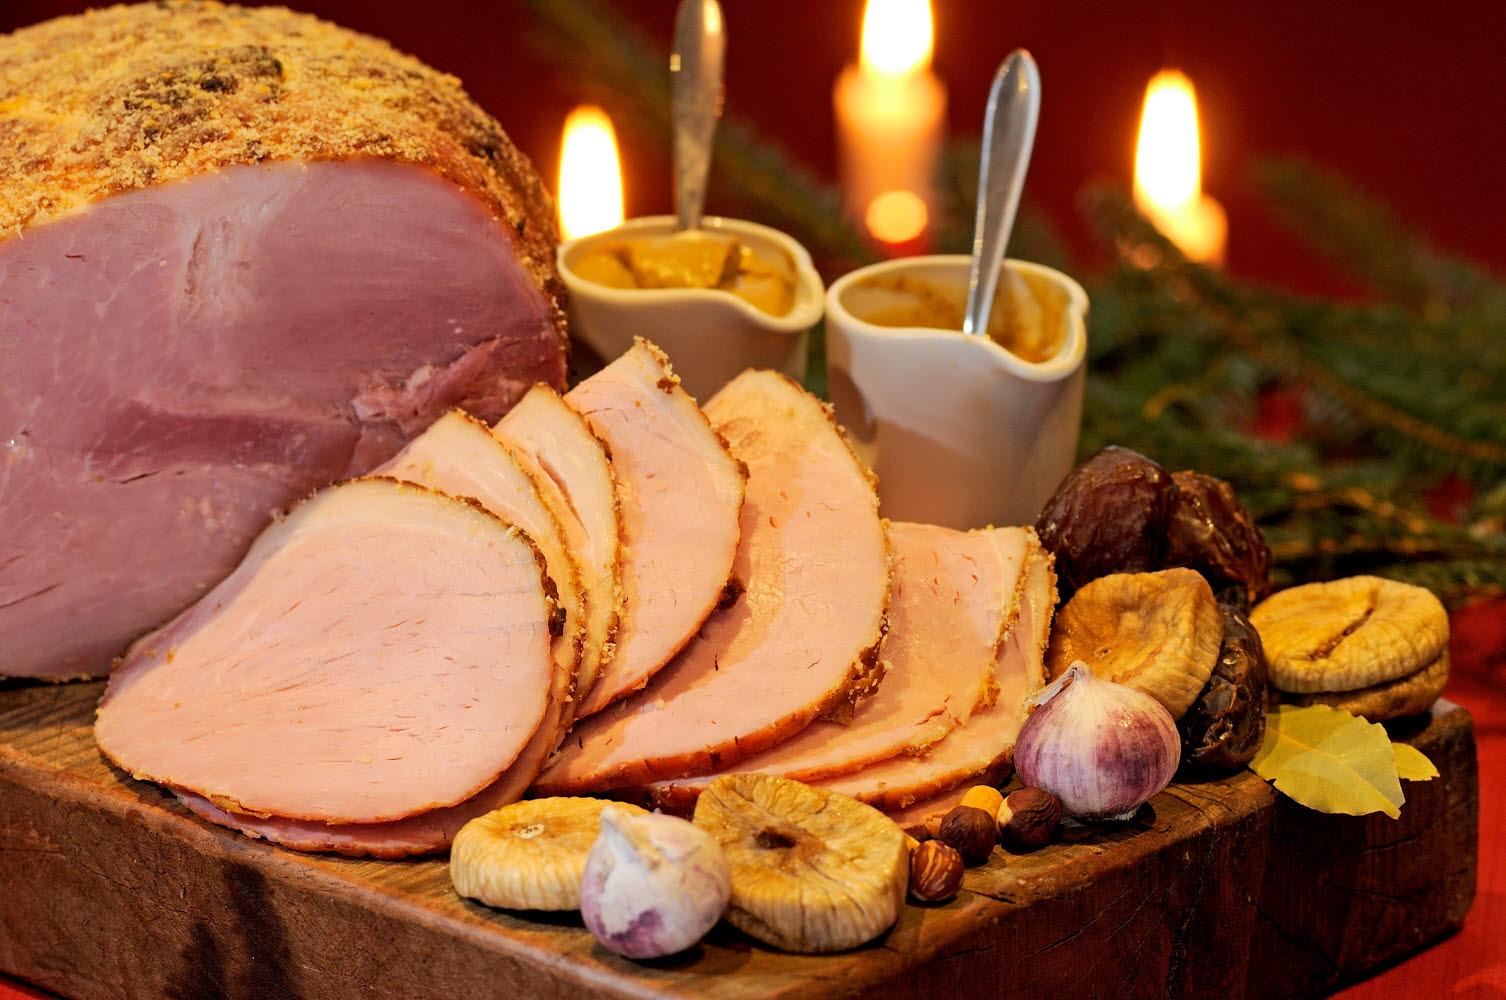 Christmas ham on a cutting board at a Christmas dinner -  Photo Cred Göran Assner